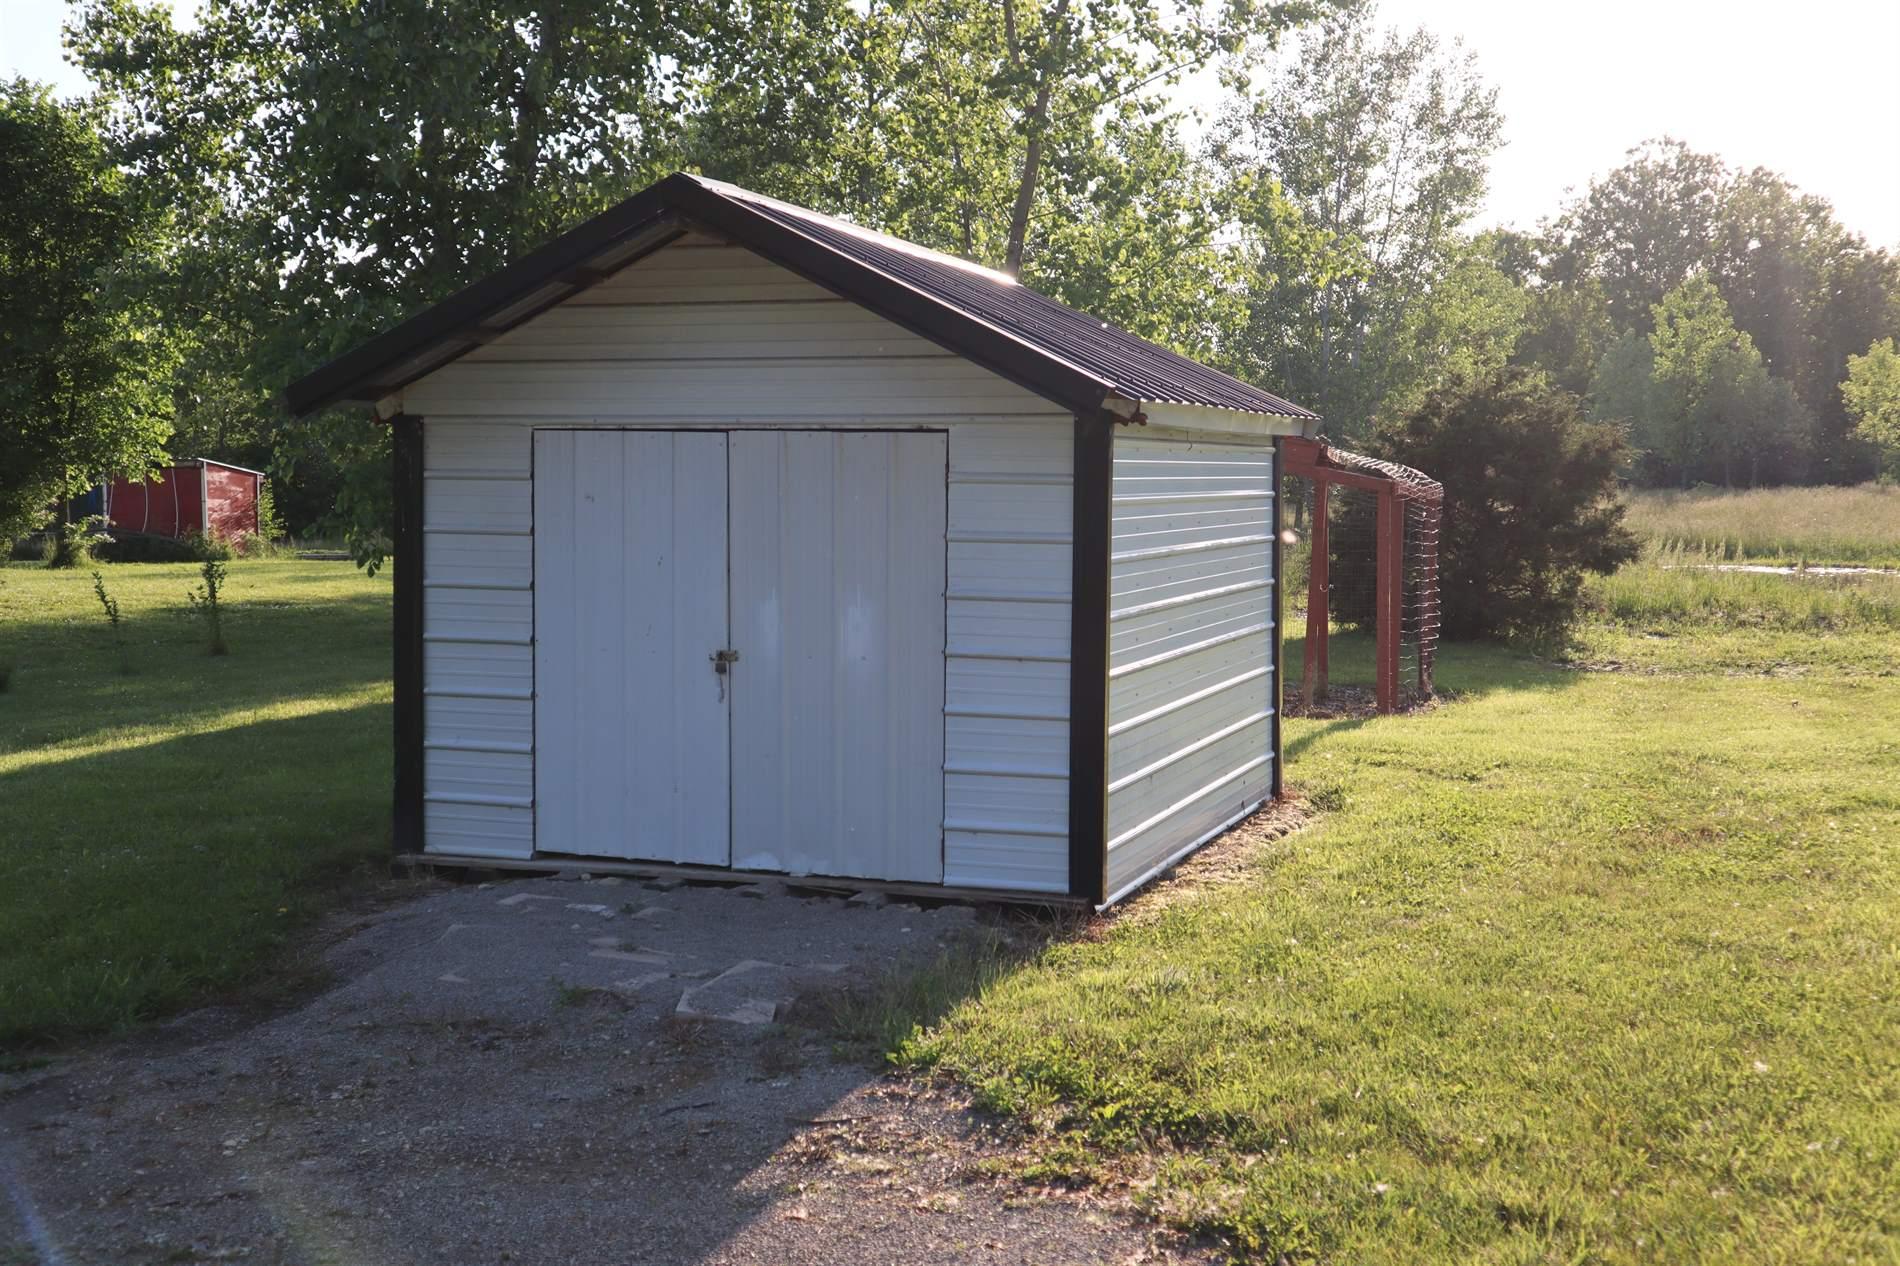 4692 County Road 25, Marengo, OH 43334